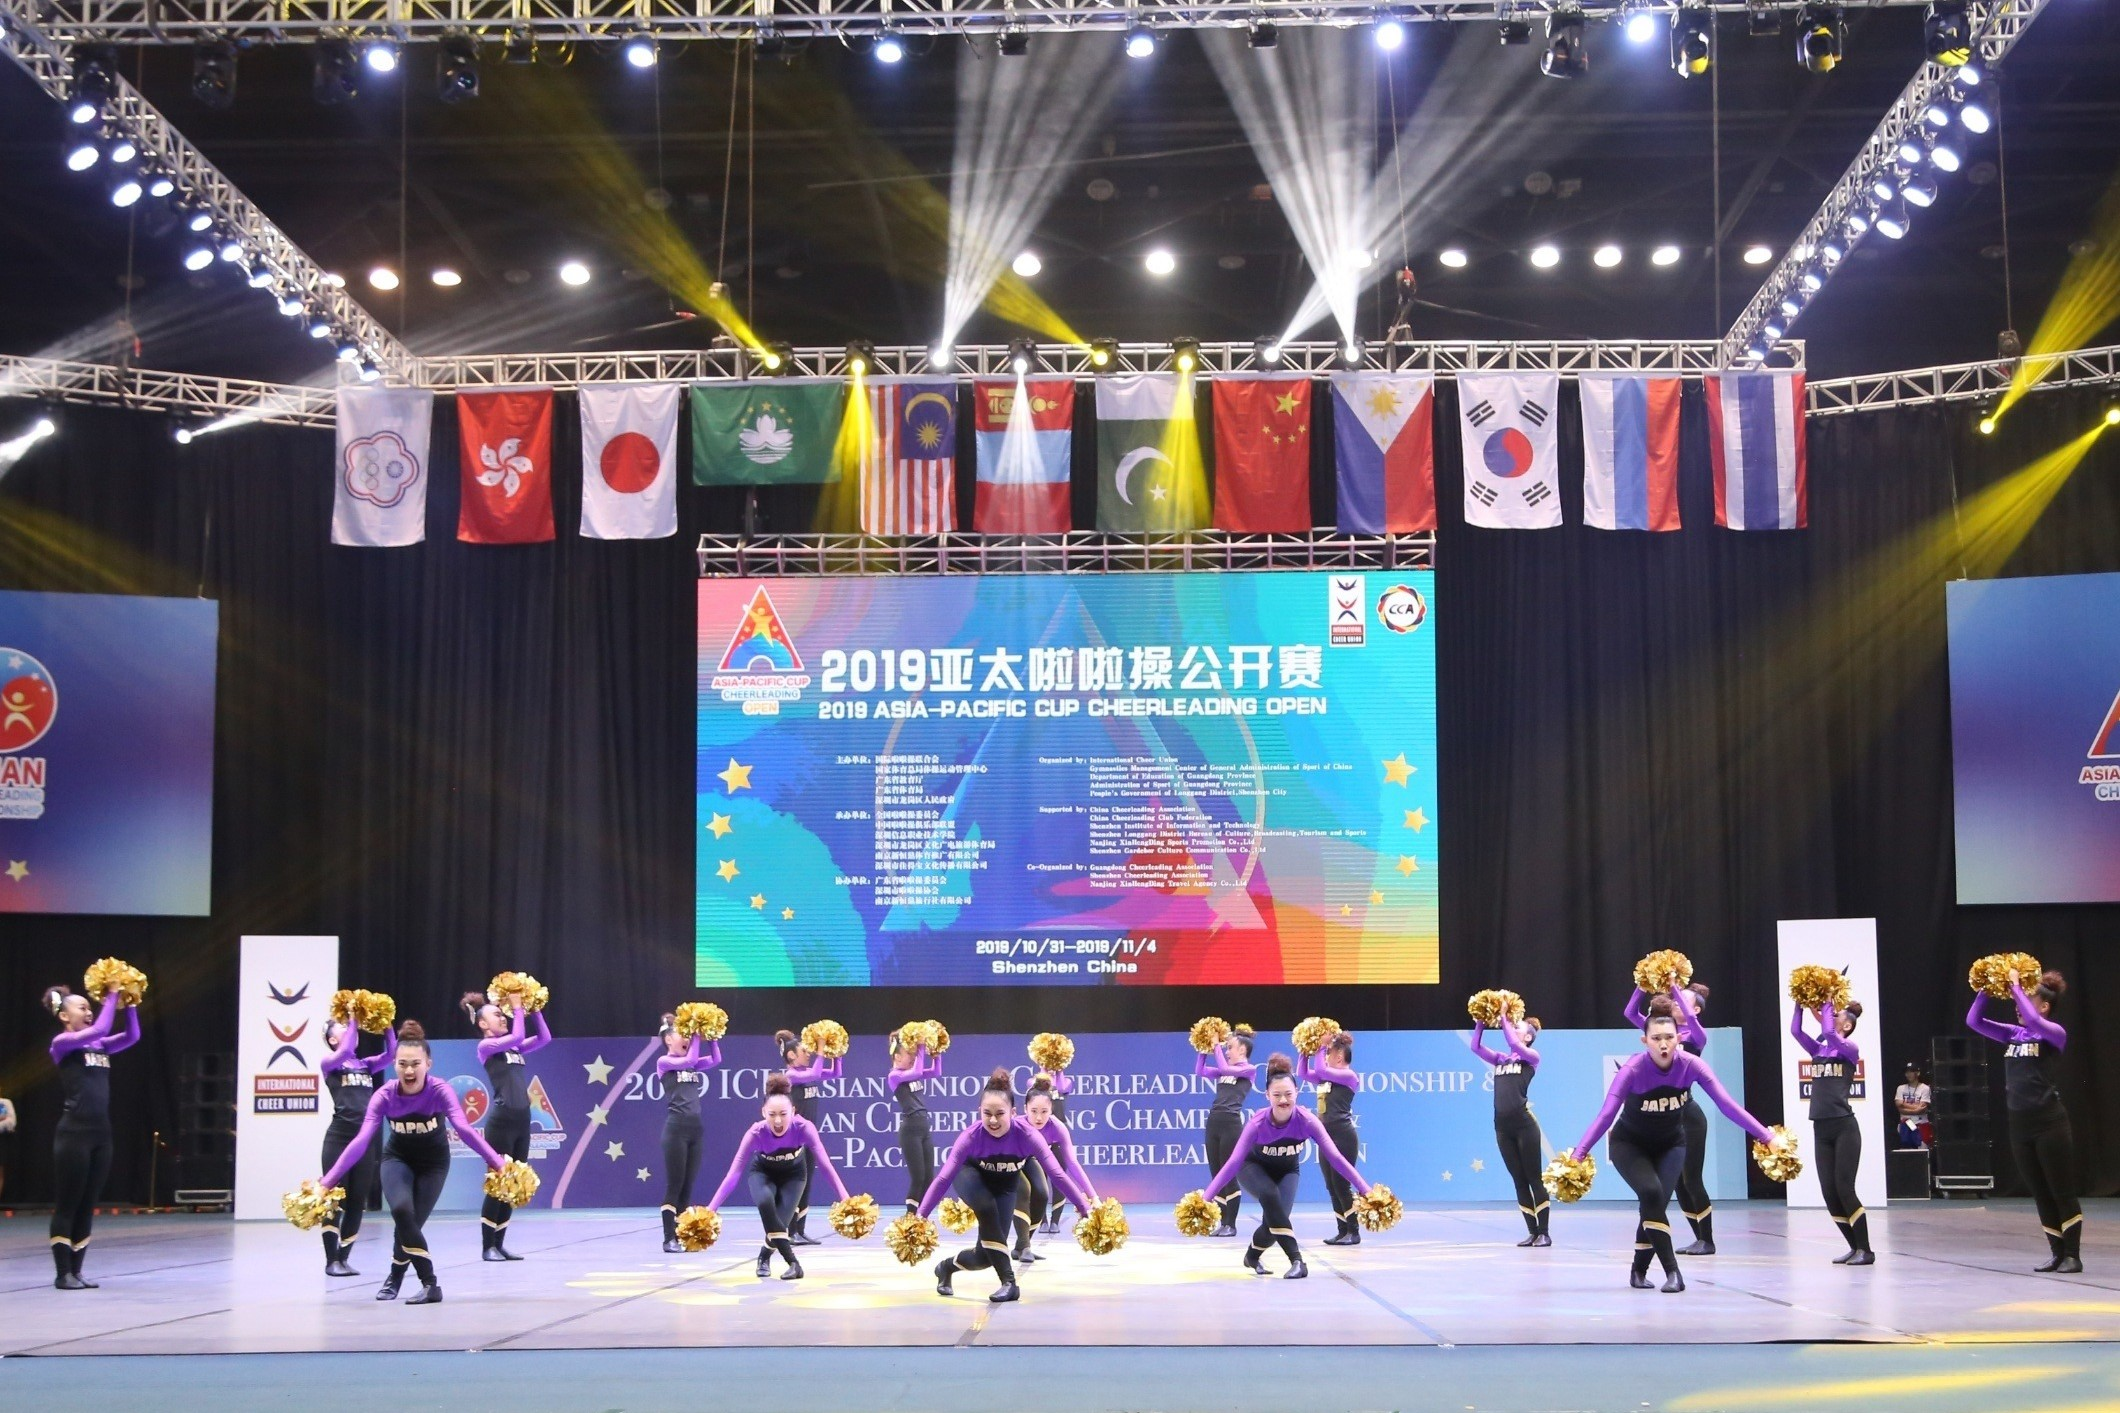 ICUアジアチアリーディング選手権大会/ICUアジアジュニアチアリーディング選手権大会/アジアパシフィックカップチアリーディングオープン